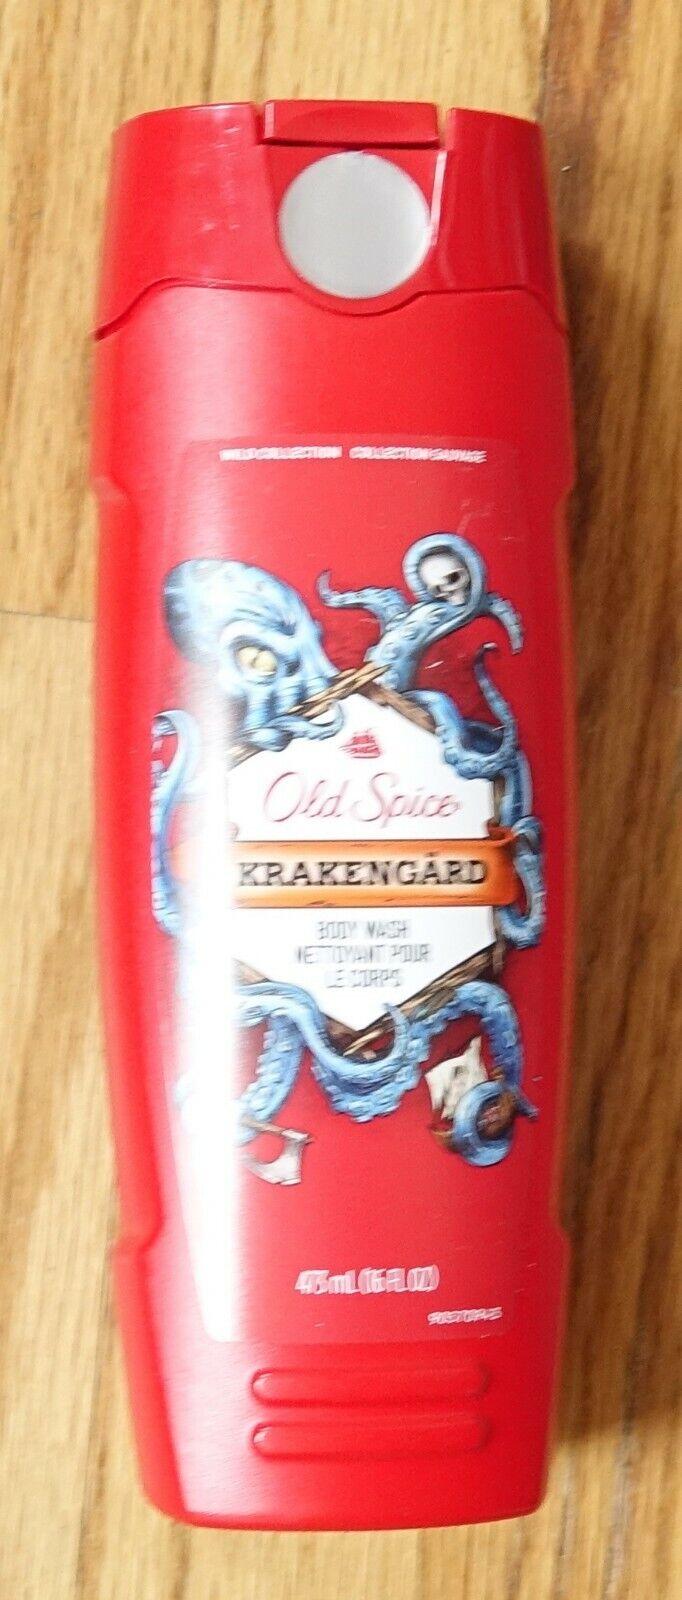 Old Spice Wild Collection Krakengard Body Wash, 16 fl oz